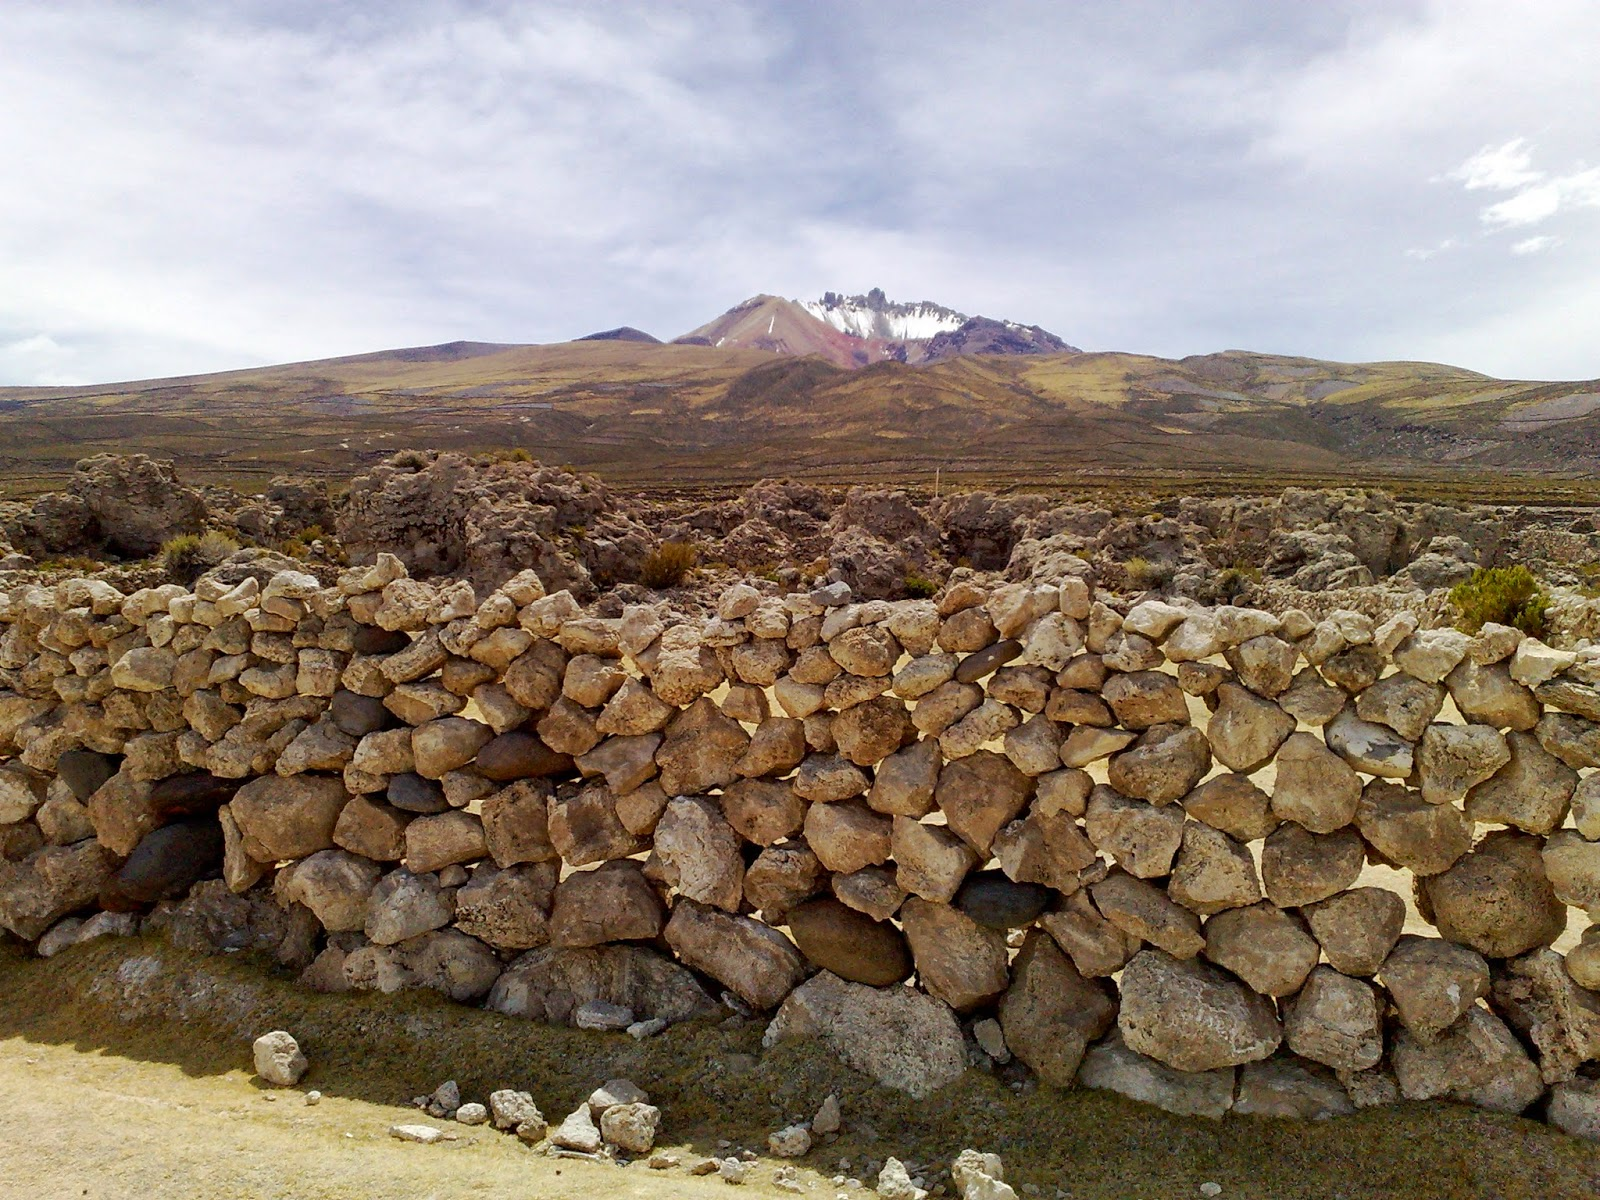 07 08092011783 - AVENTURA: SALAR DE UYUNI E LAGUNAS BOLIVIANAS VIA ACRE